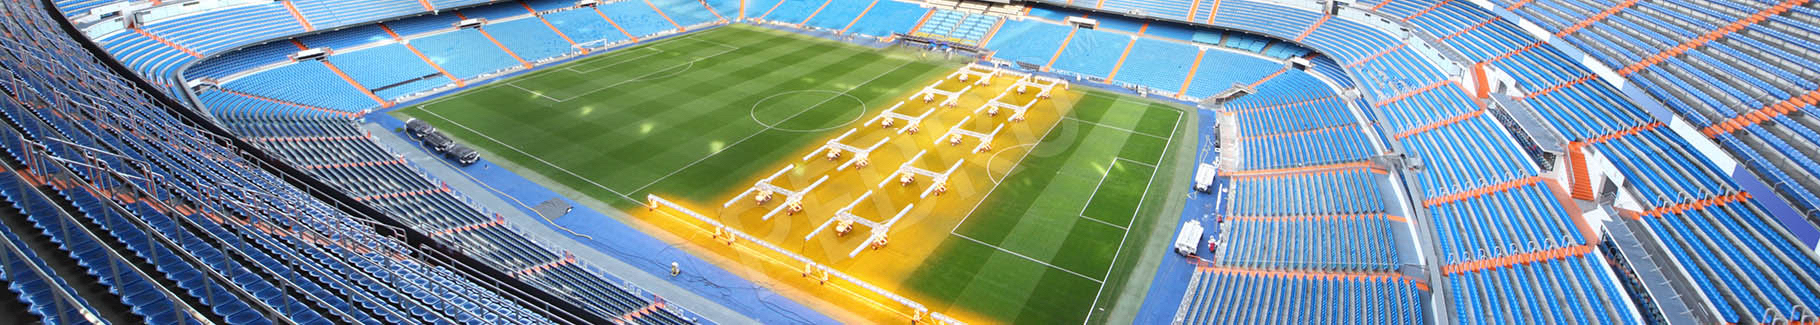 Fototapeta stadion 3D